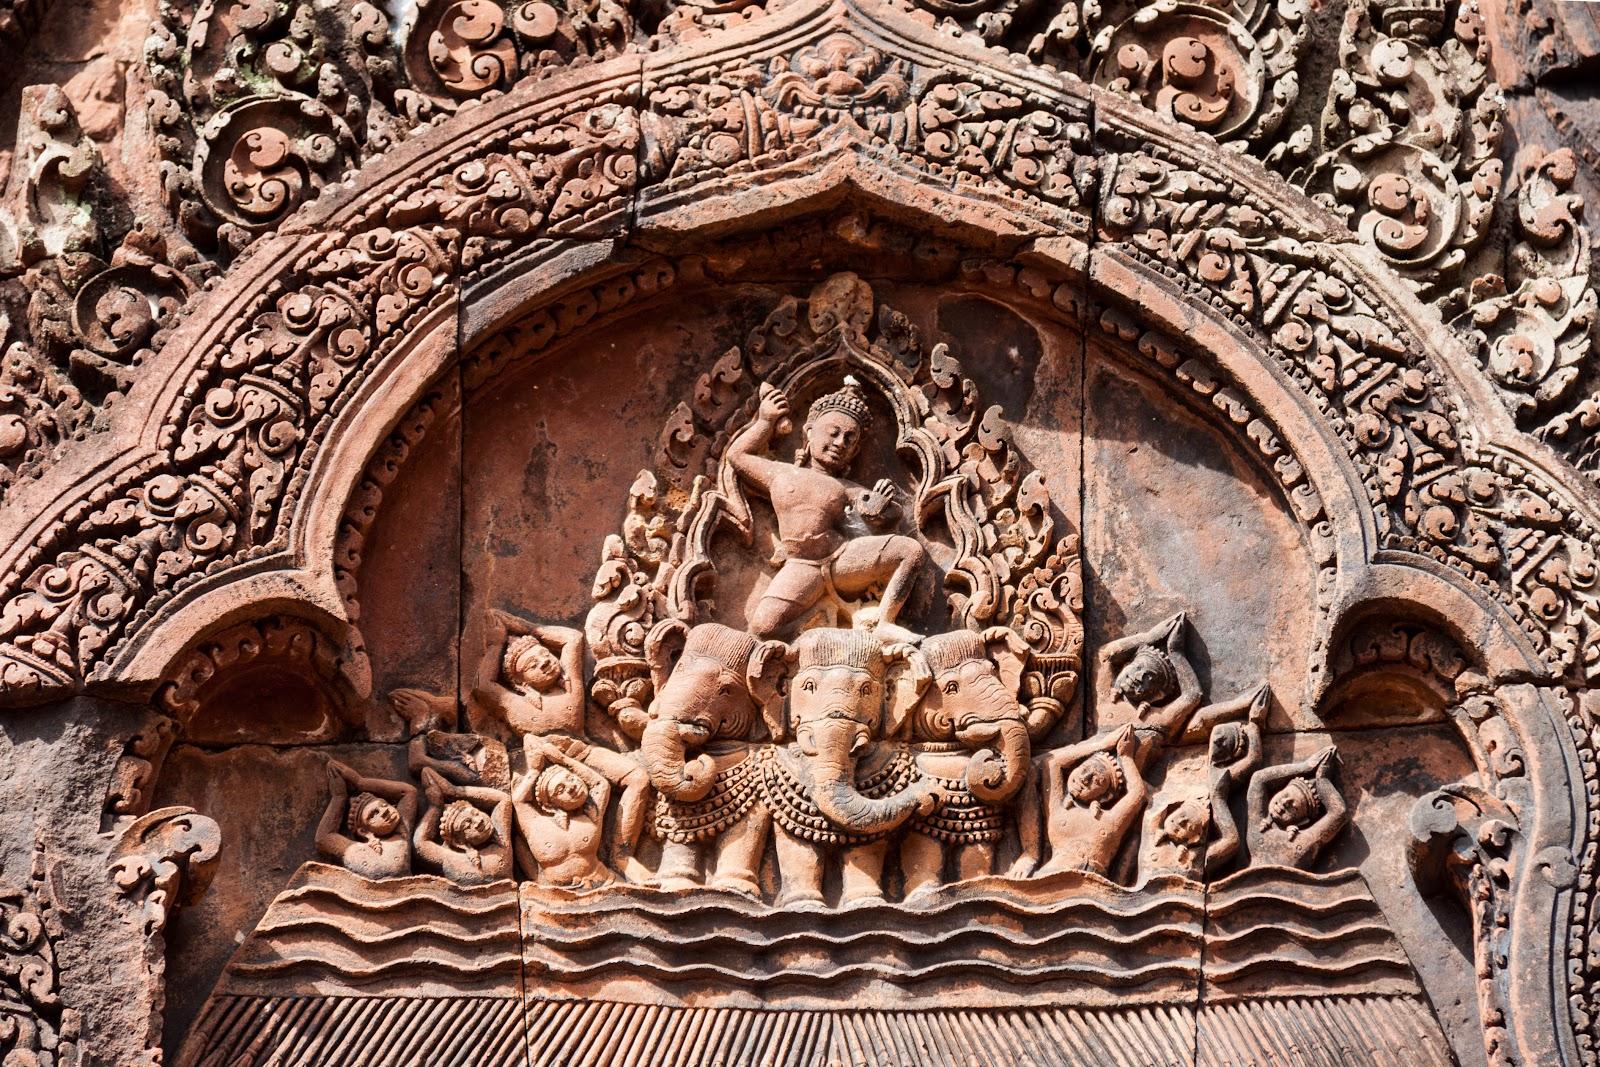 https://upload.wikimedia.org/wikipedia/commons/c/c6/Angkor_SiemReap_Cambodia_Banteay_Srei-Relief-01.jpg